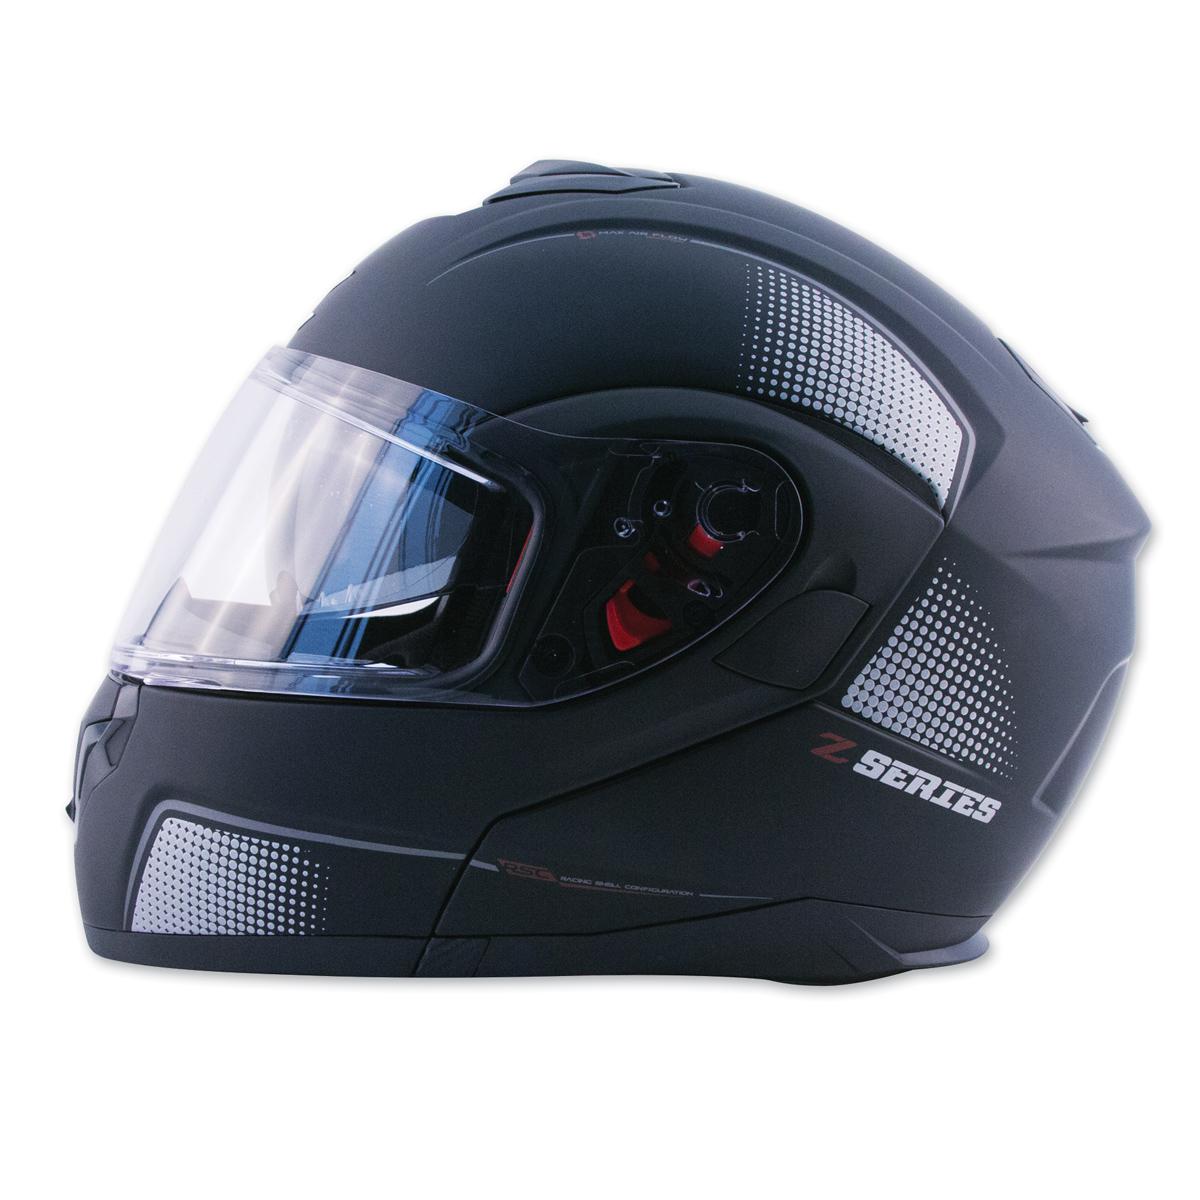 0e17c65c Zox Z-Series Z-MOD10 Atom Matte Black Modular Helmet - 88-33591 ...